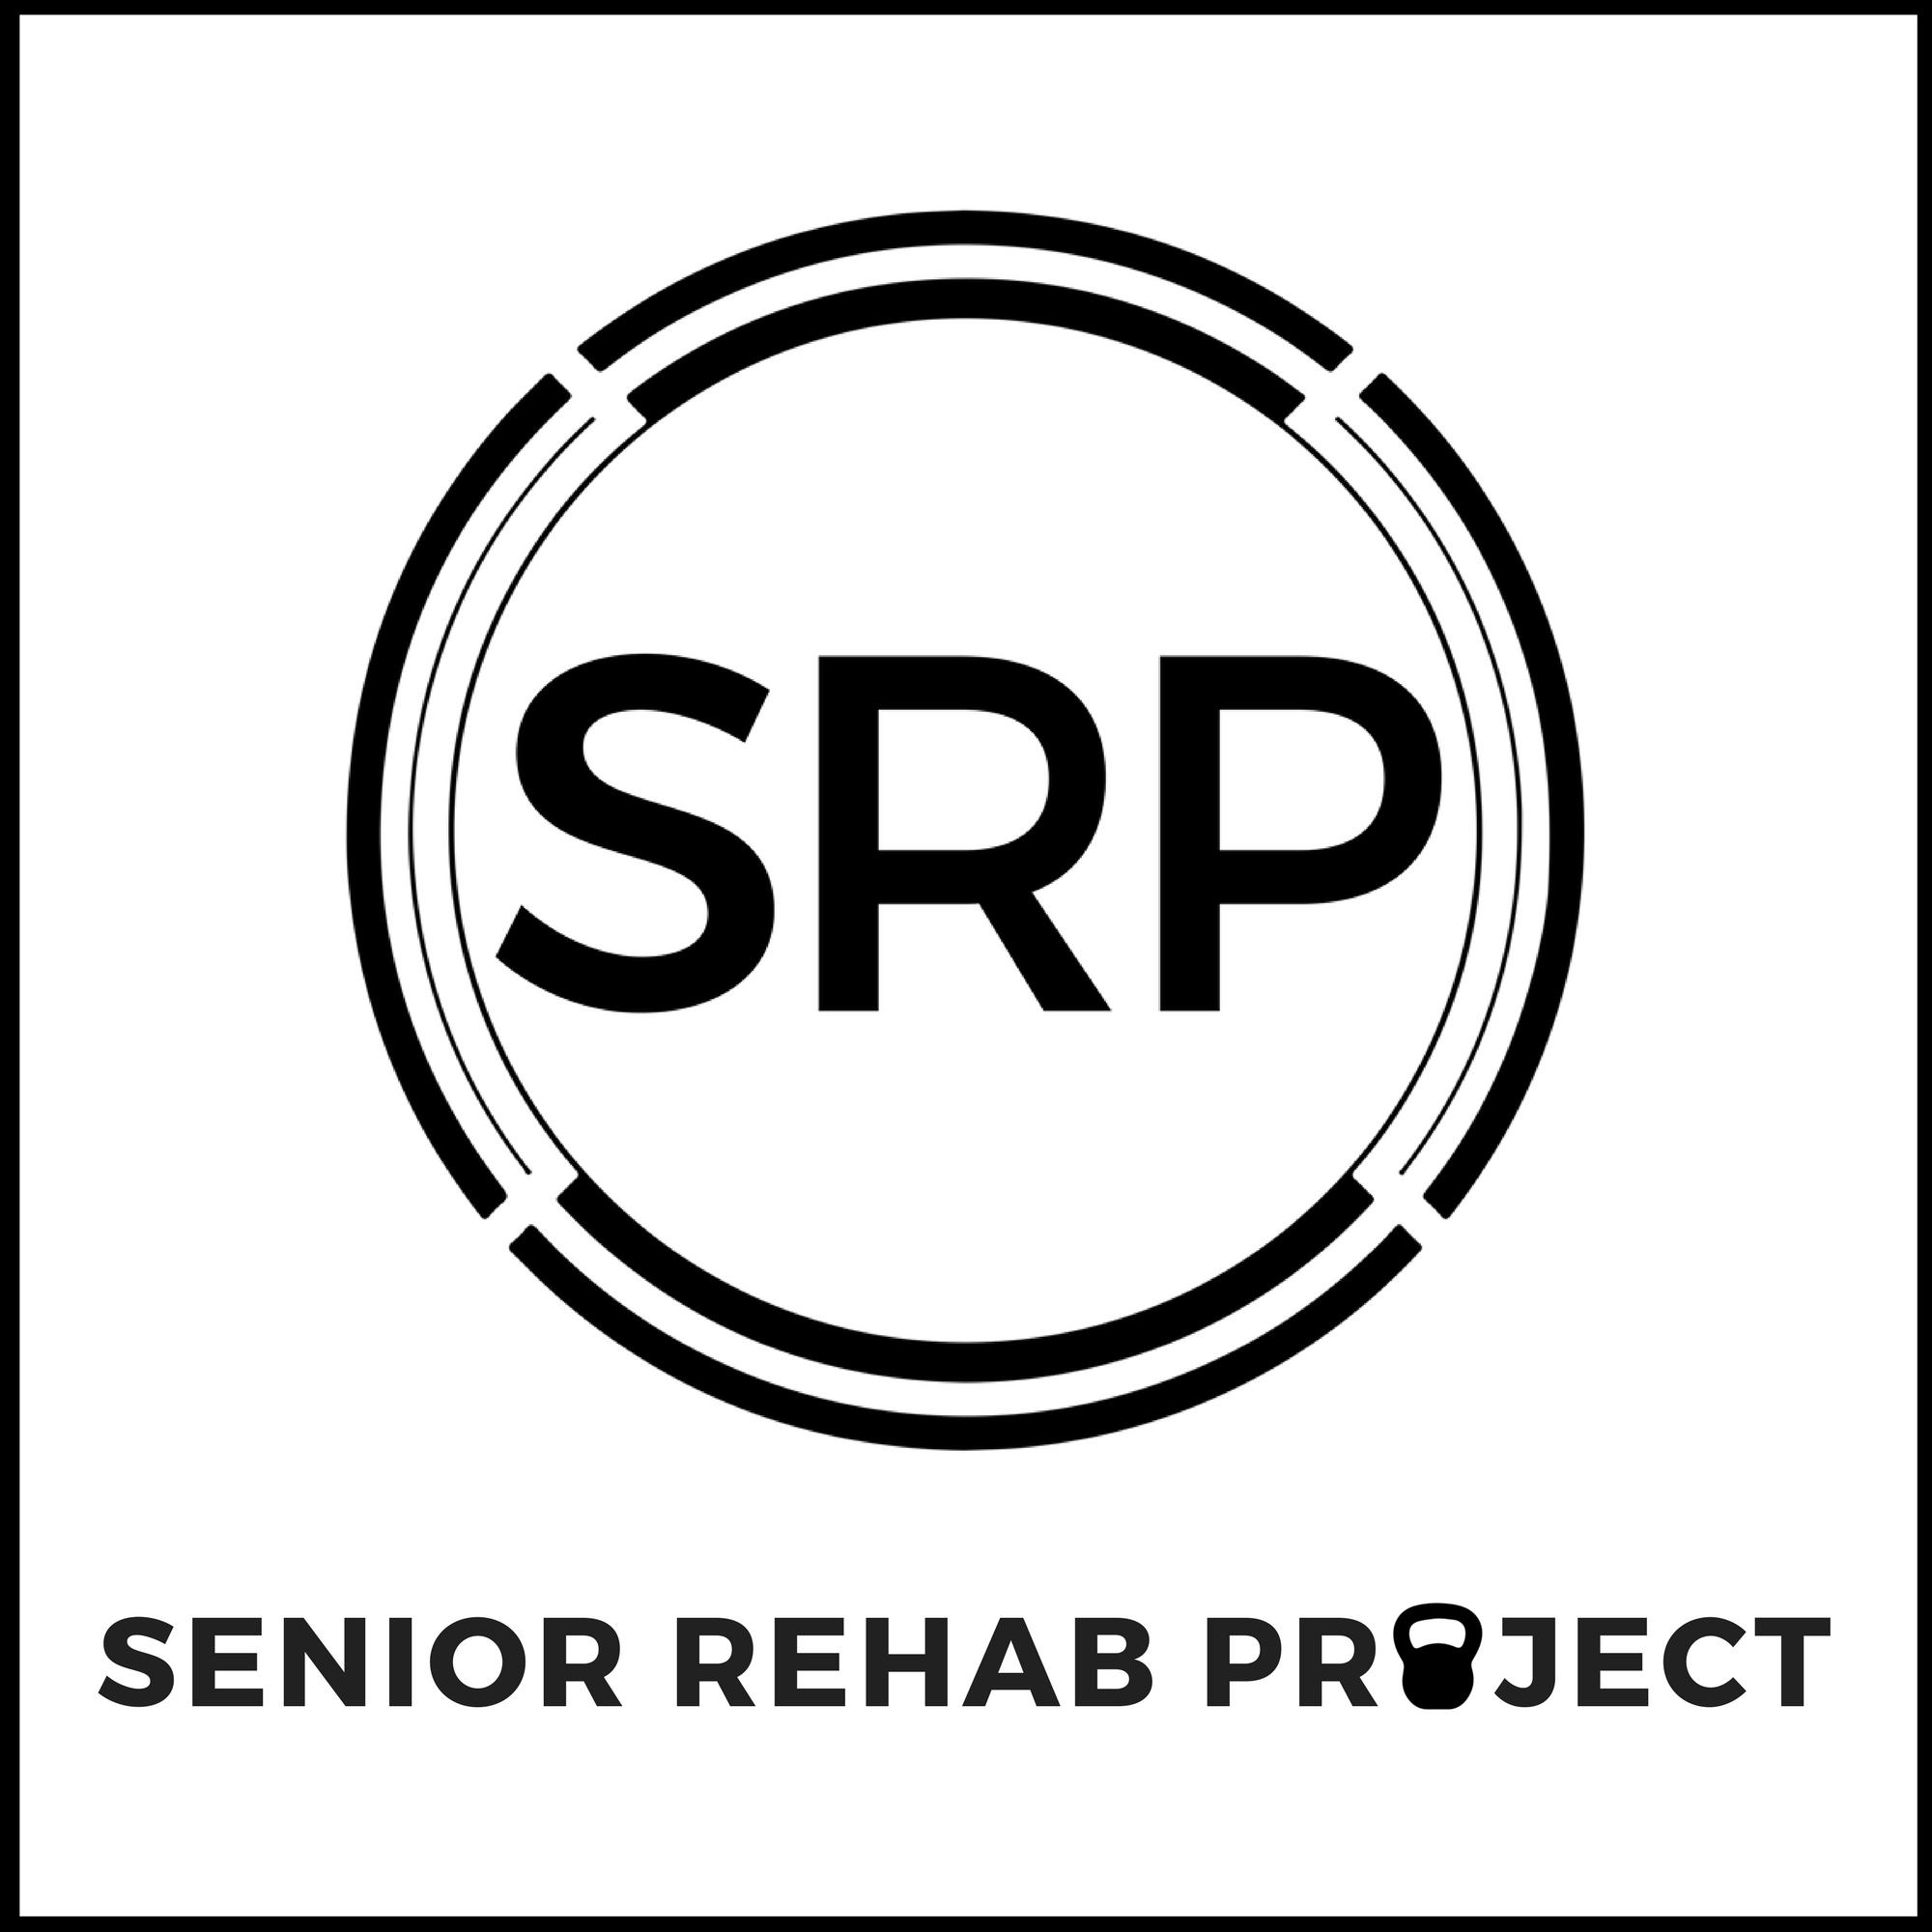 Senior Rehab Project - Physical Therapy   Rehabilitation   Geriatrics